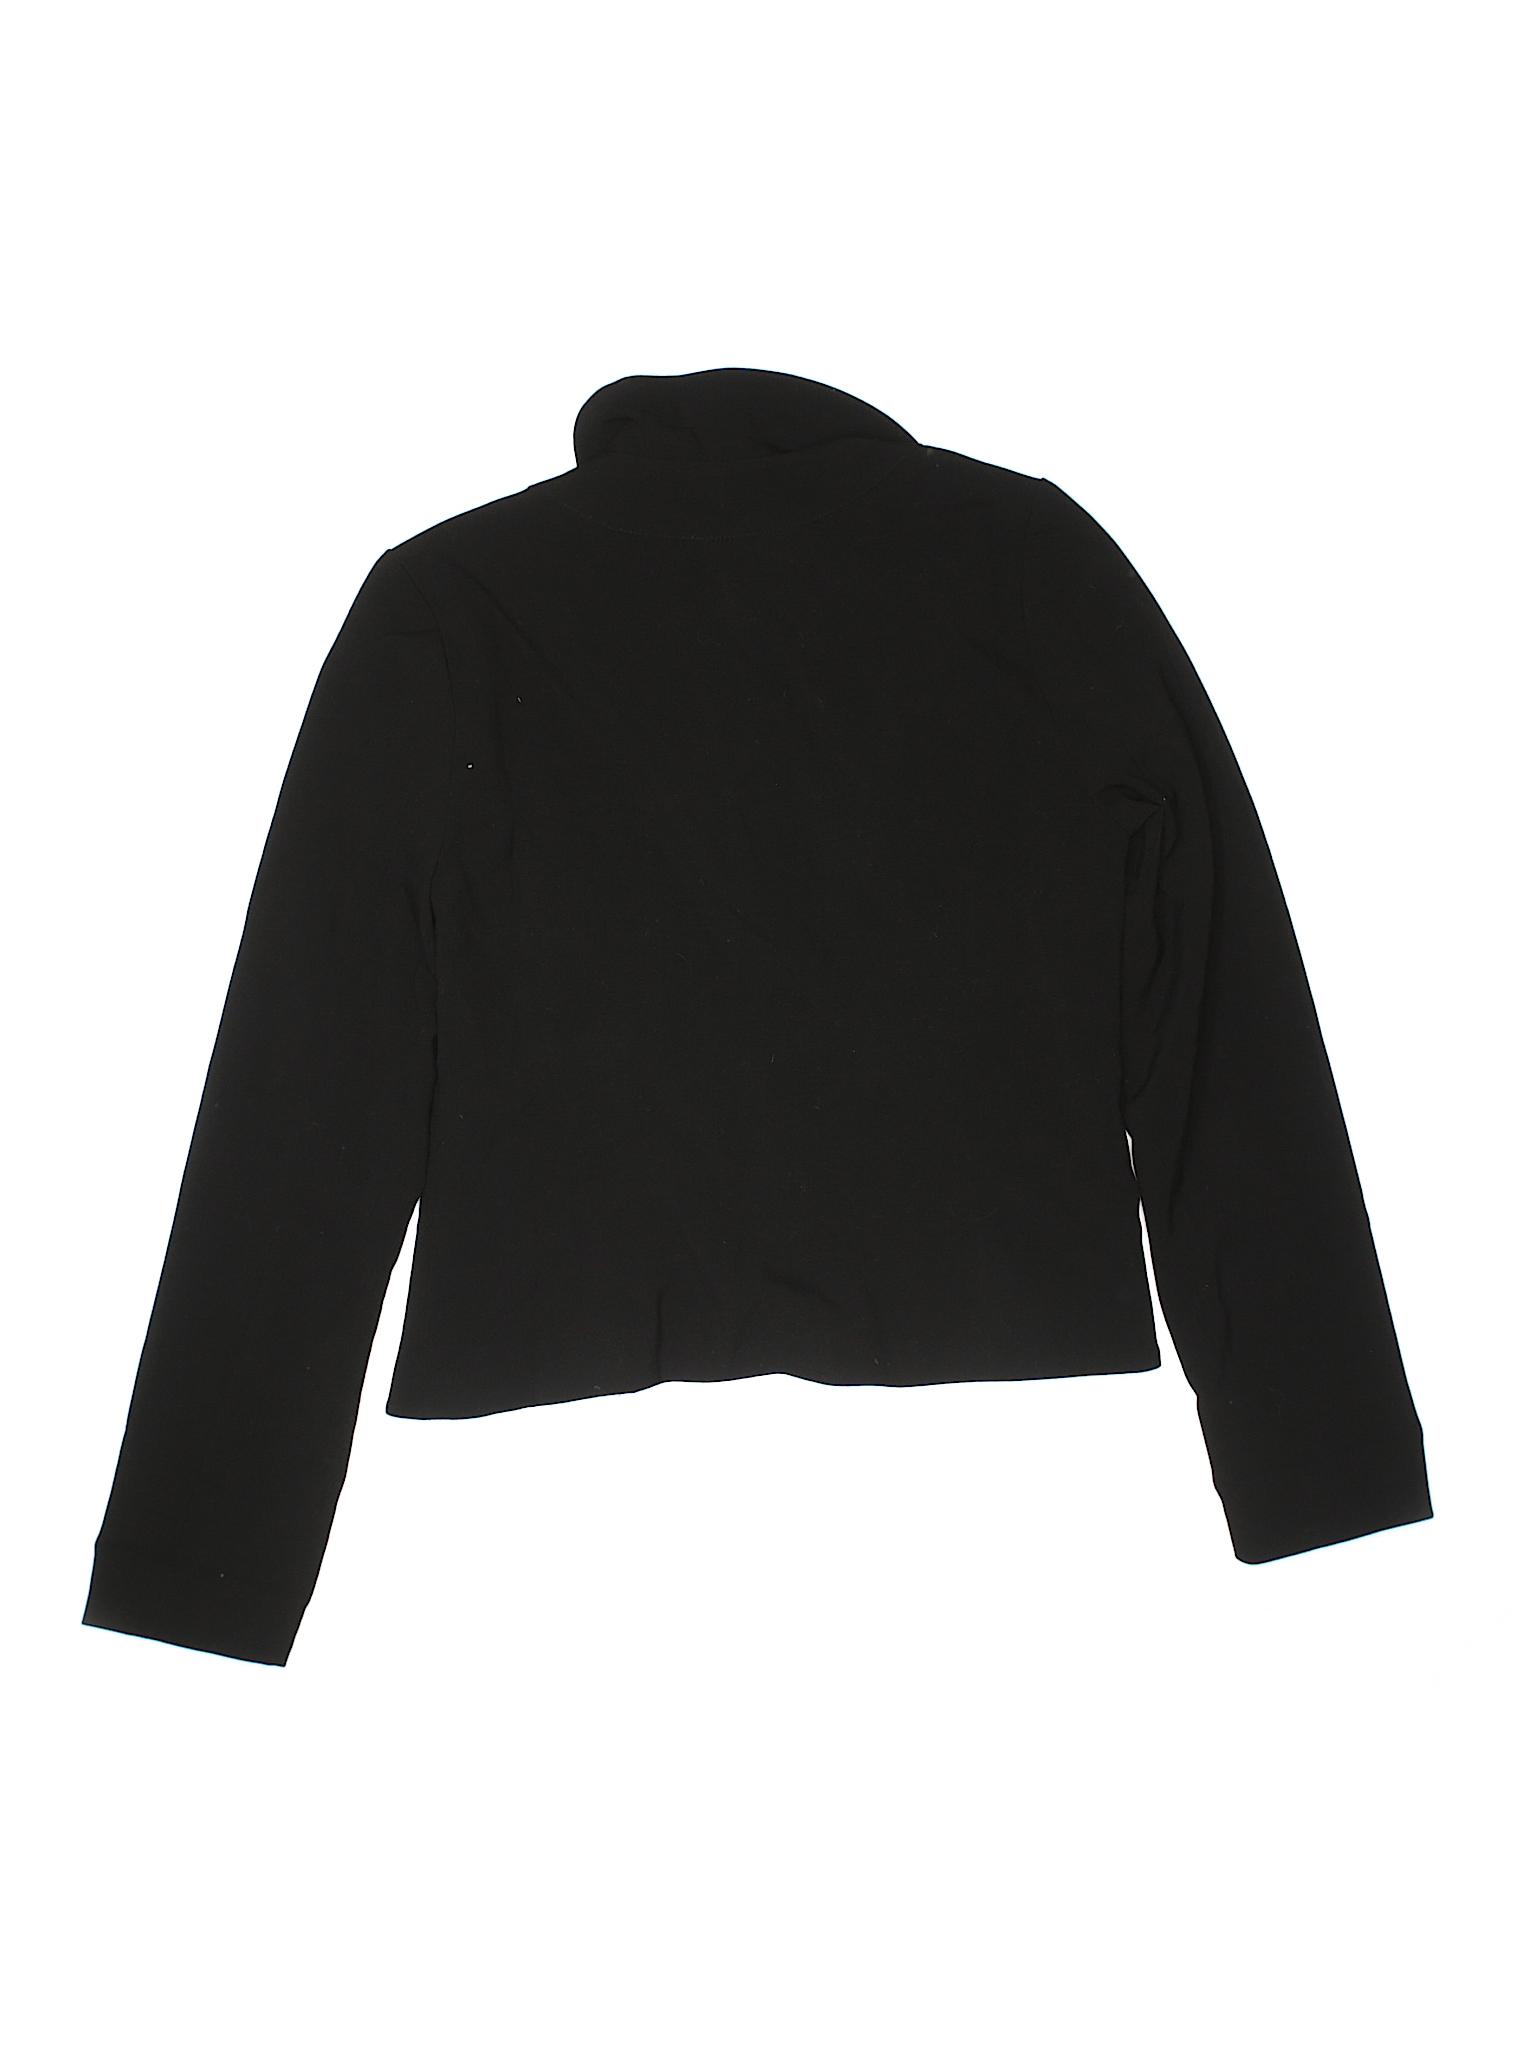 Boutique XXI Boutique Jacket XXI XXI Boutique leisure Boutique leisure Boutique leisure Jacket XXI Jacket Jacket leisure qZT7wZI8